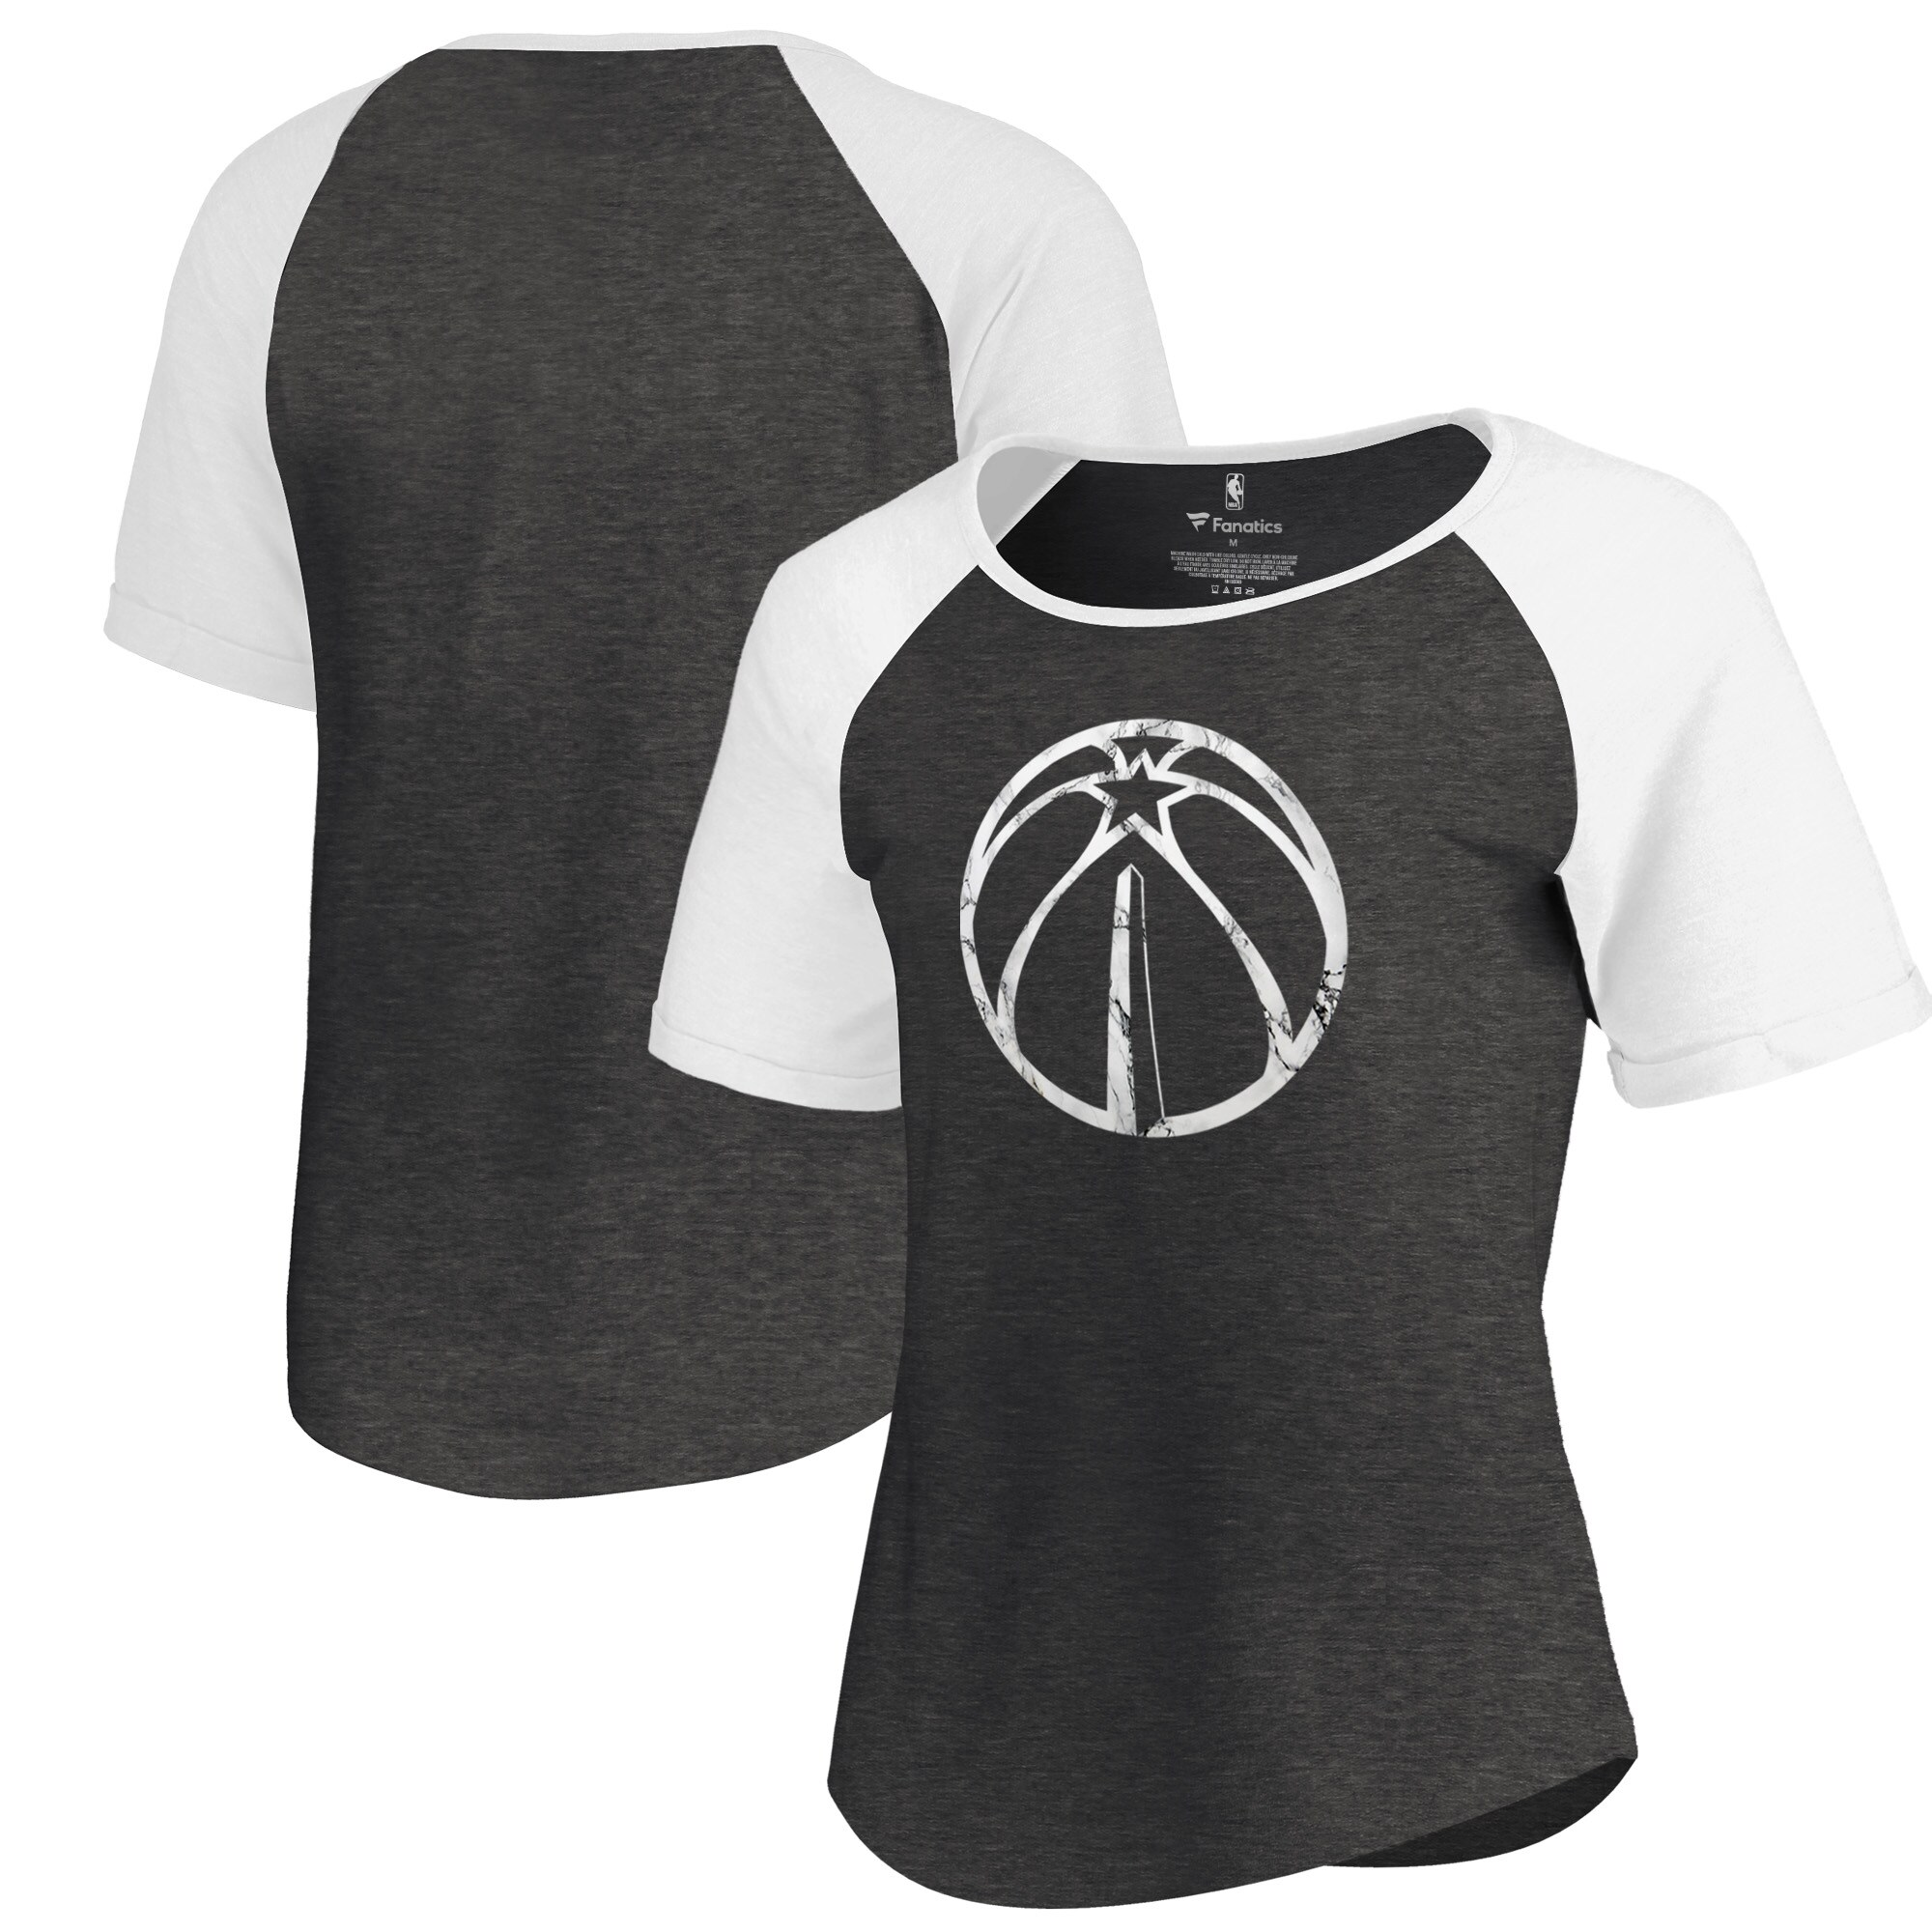 Washington Wizards Fanatics Branded Women's Marble Logo Raglan T-Shirt - Black